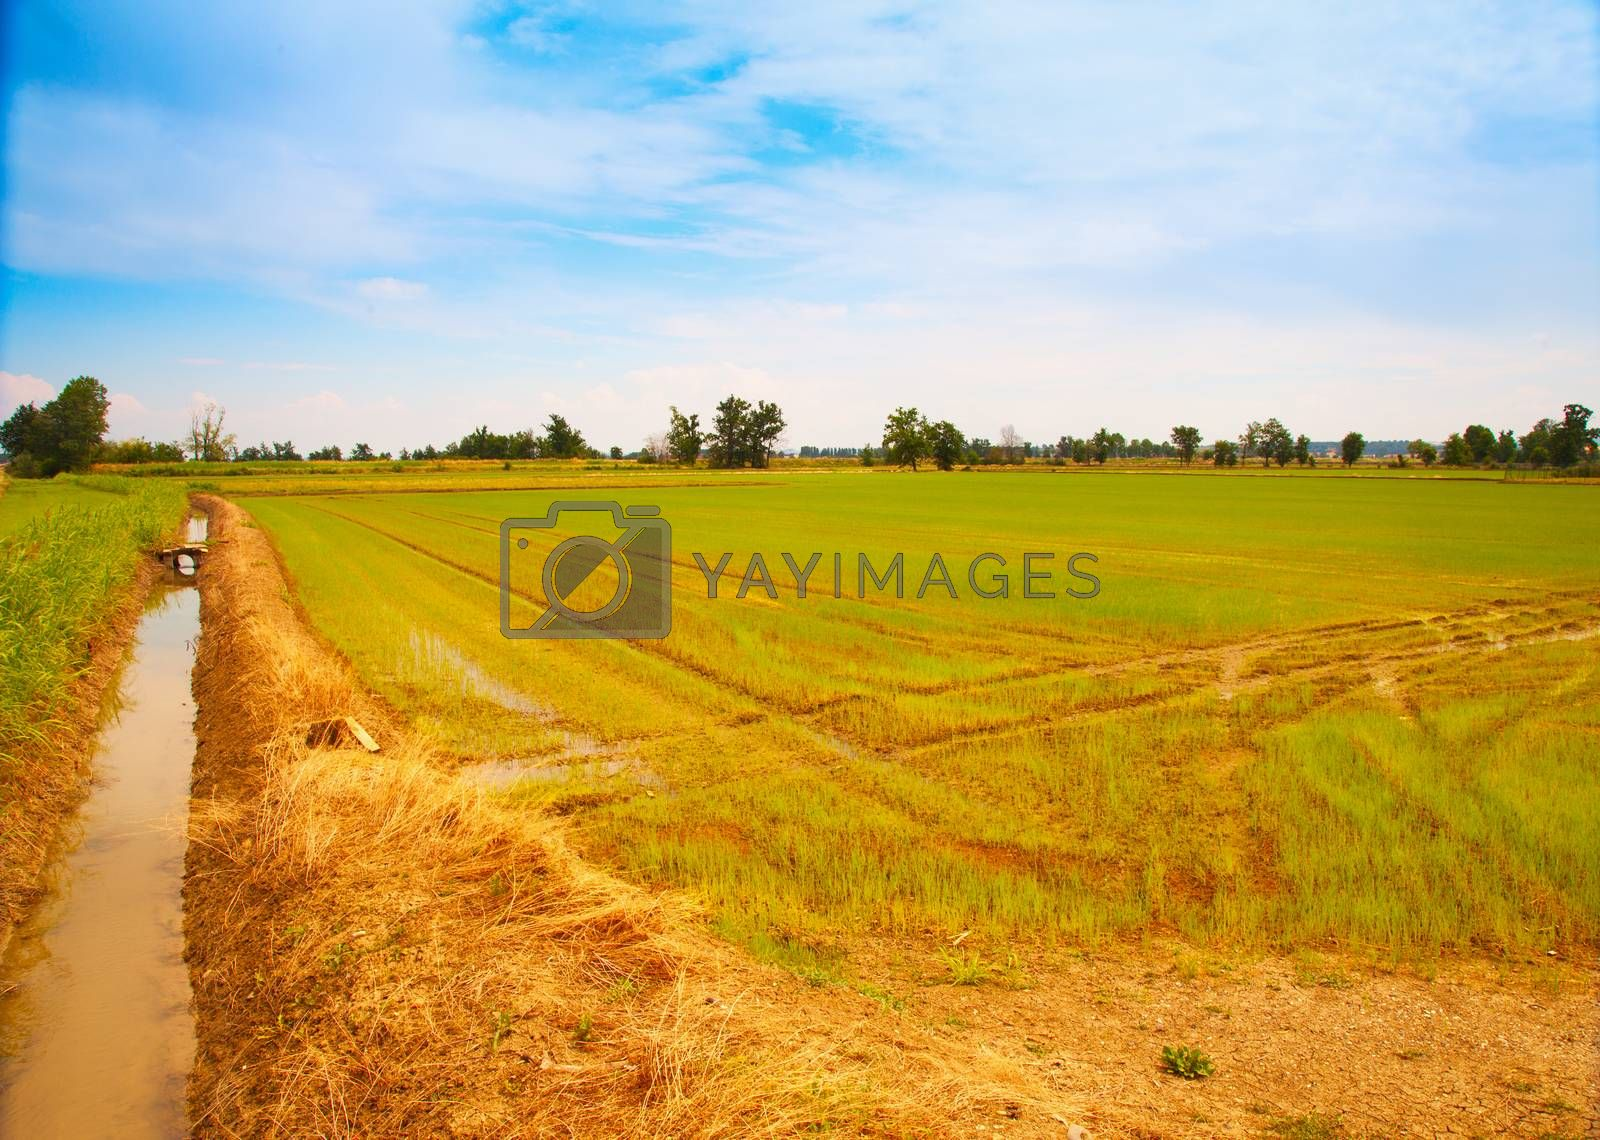 Panorama by Koufax73